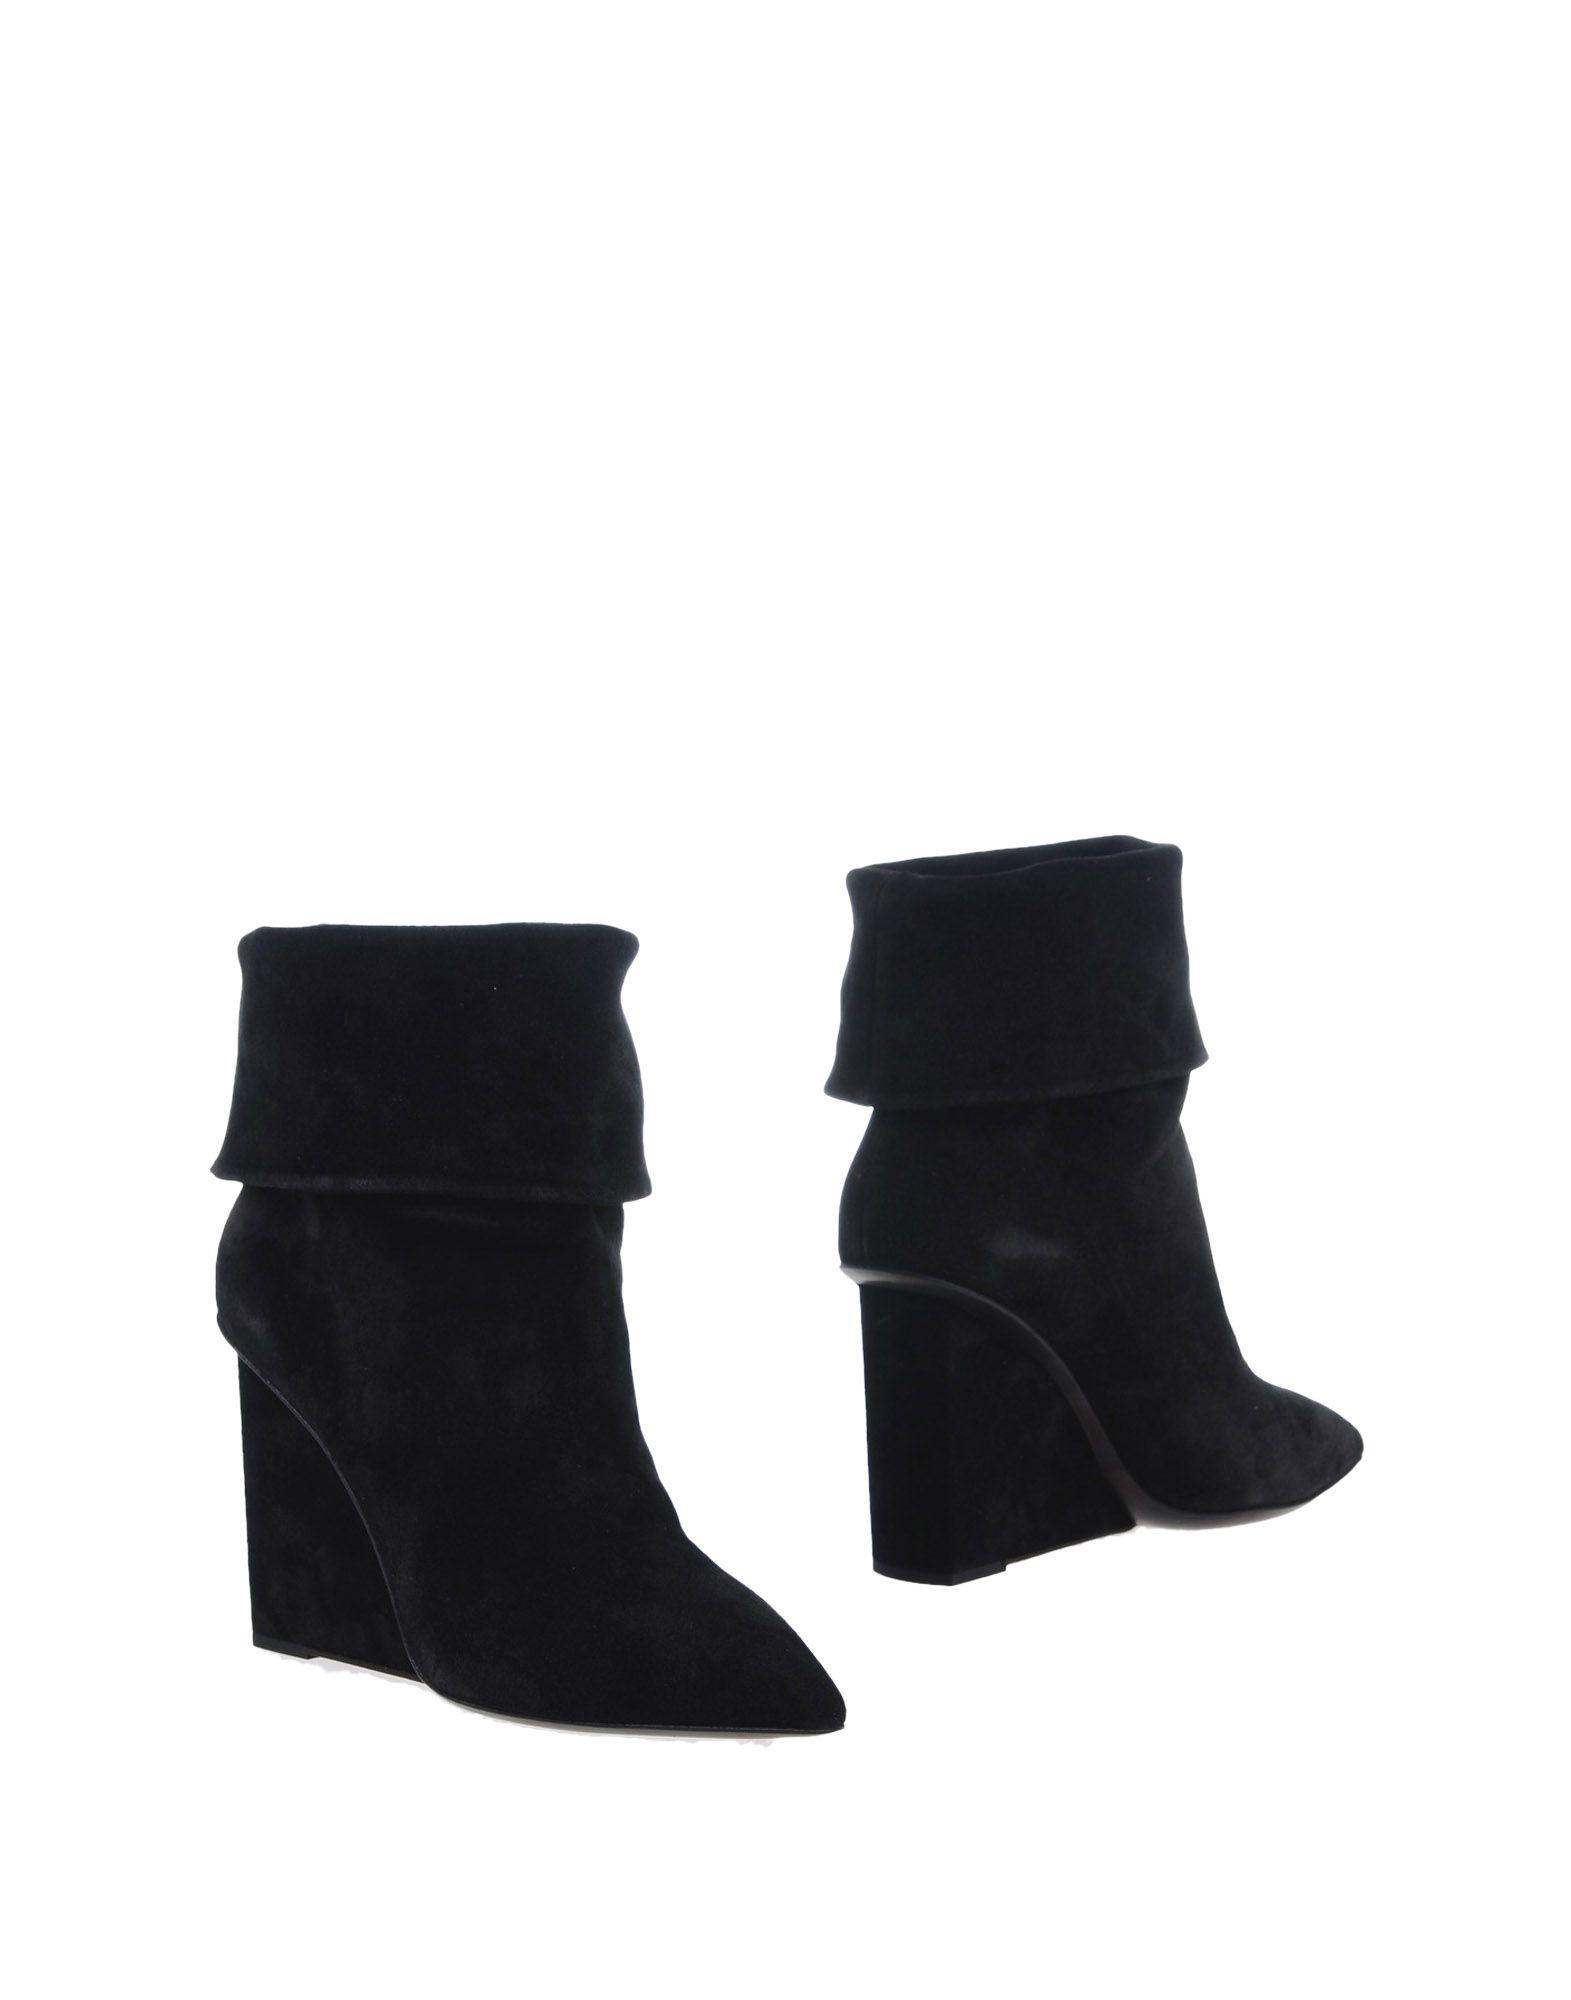 Gianmarco Lorenzi Ankle Boot - Women Gianmarco Lorenzi  Ankle Boots online on  Lorenzi United Kingdom - 11223993EF 425f1e